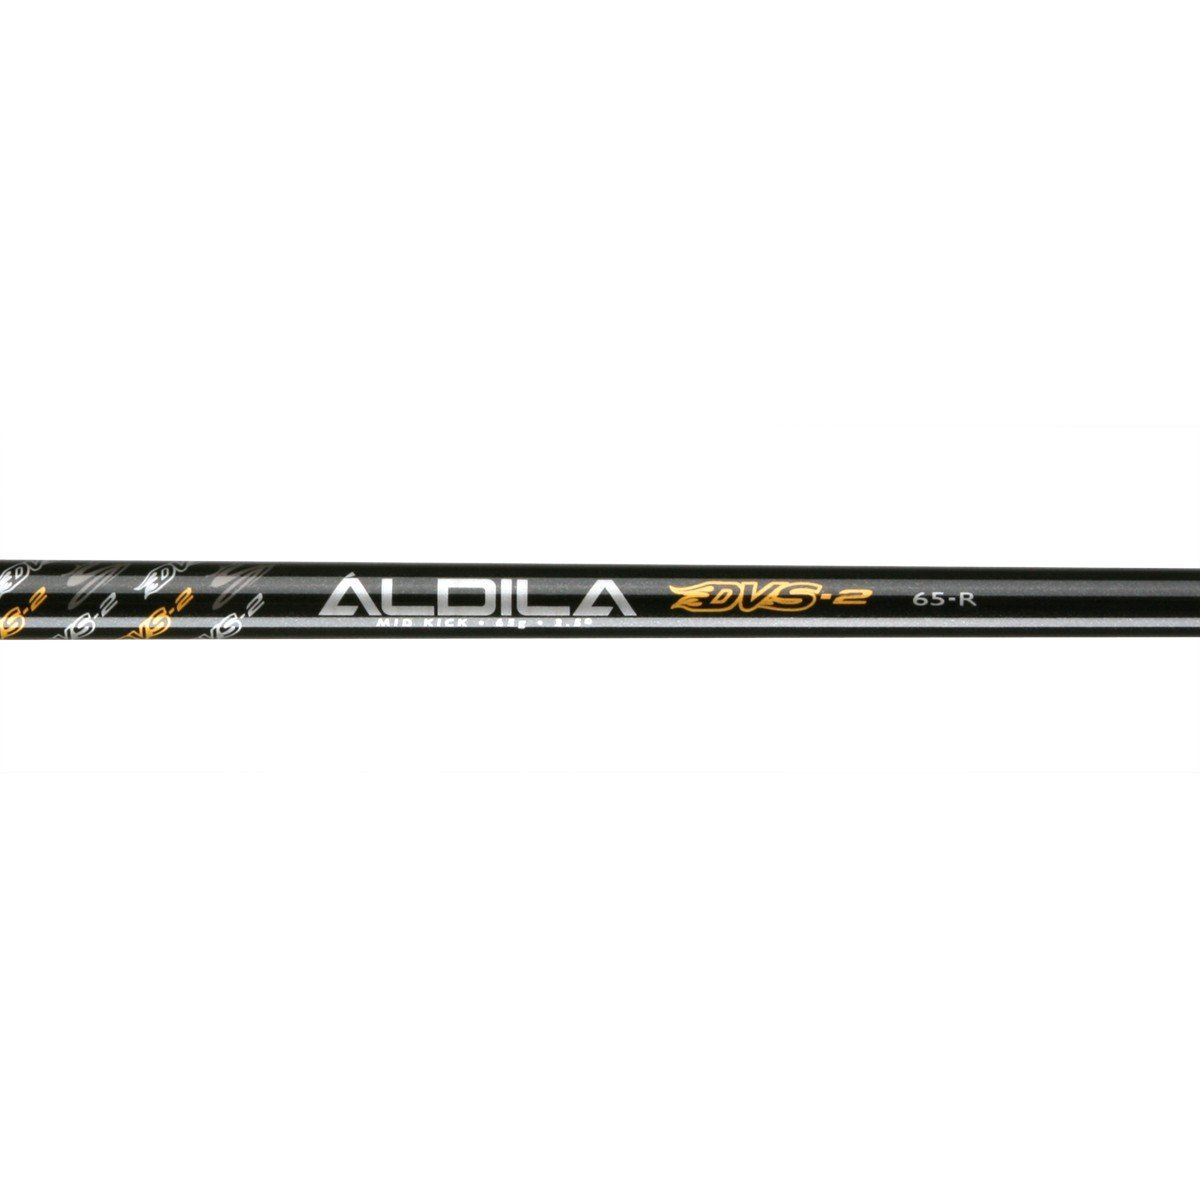 Cobra Golf/Aldila DVS-2 65 - #5 Iron R Flex 39''